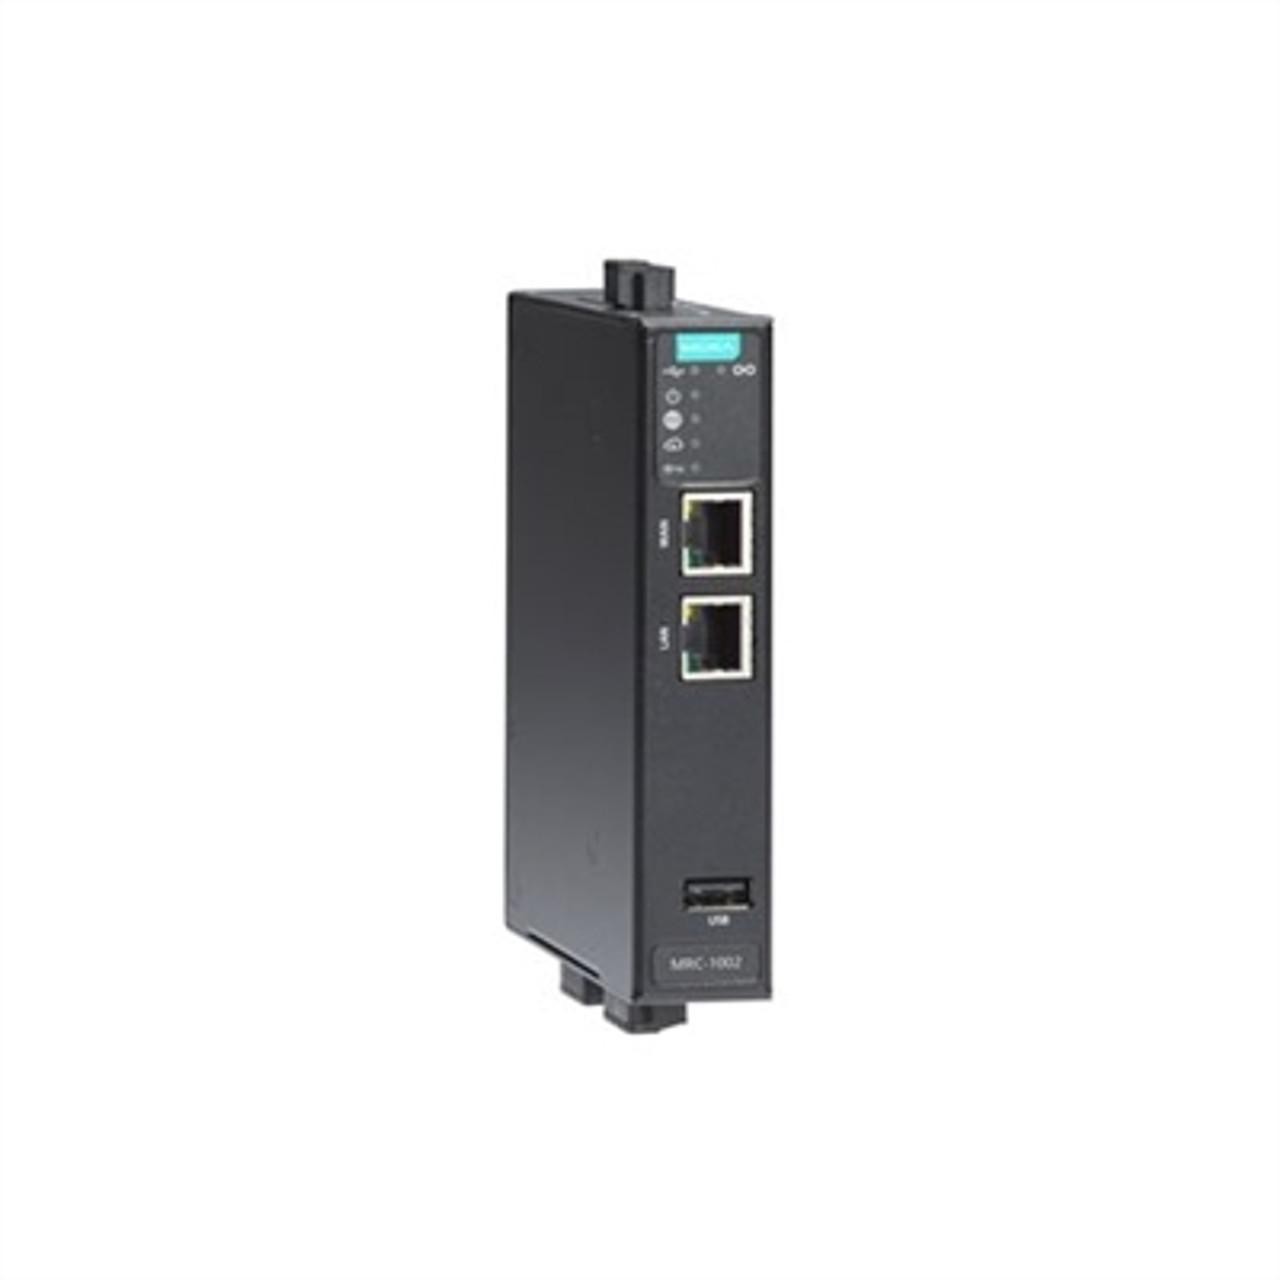 Moxa MRC-1002-T Moxa Remote Connect gateway